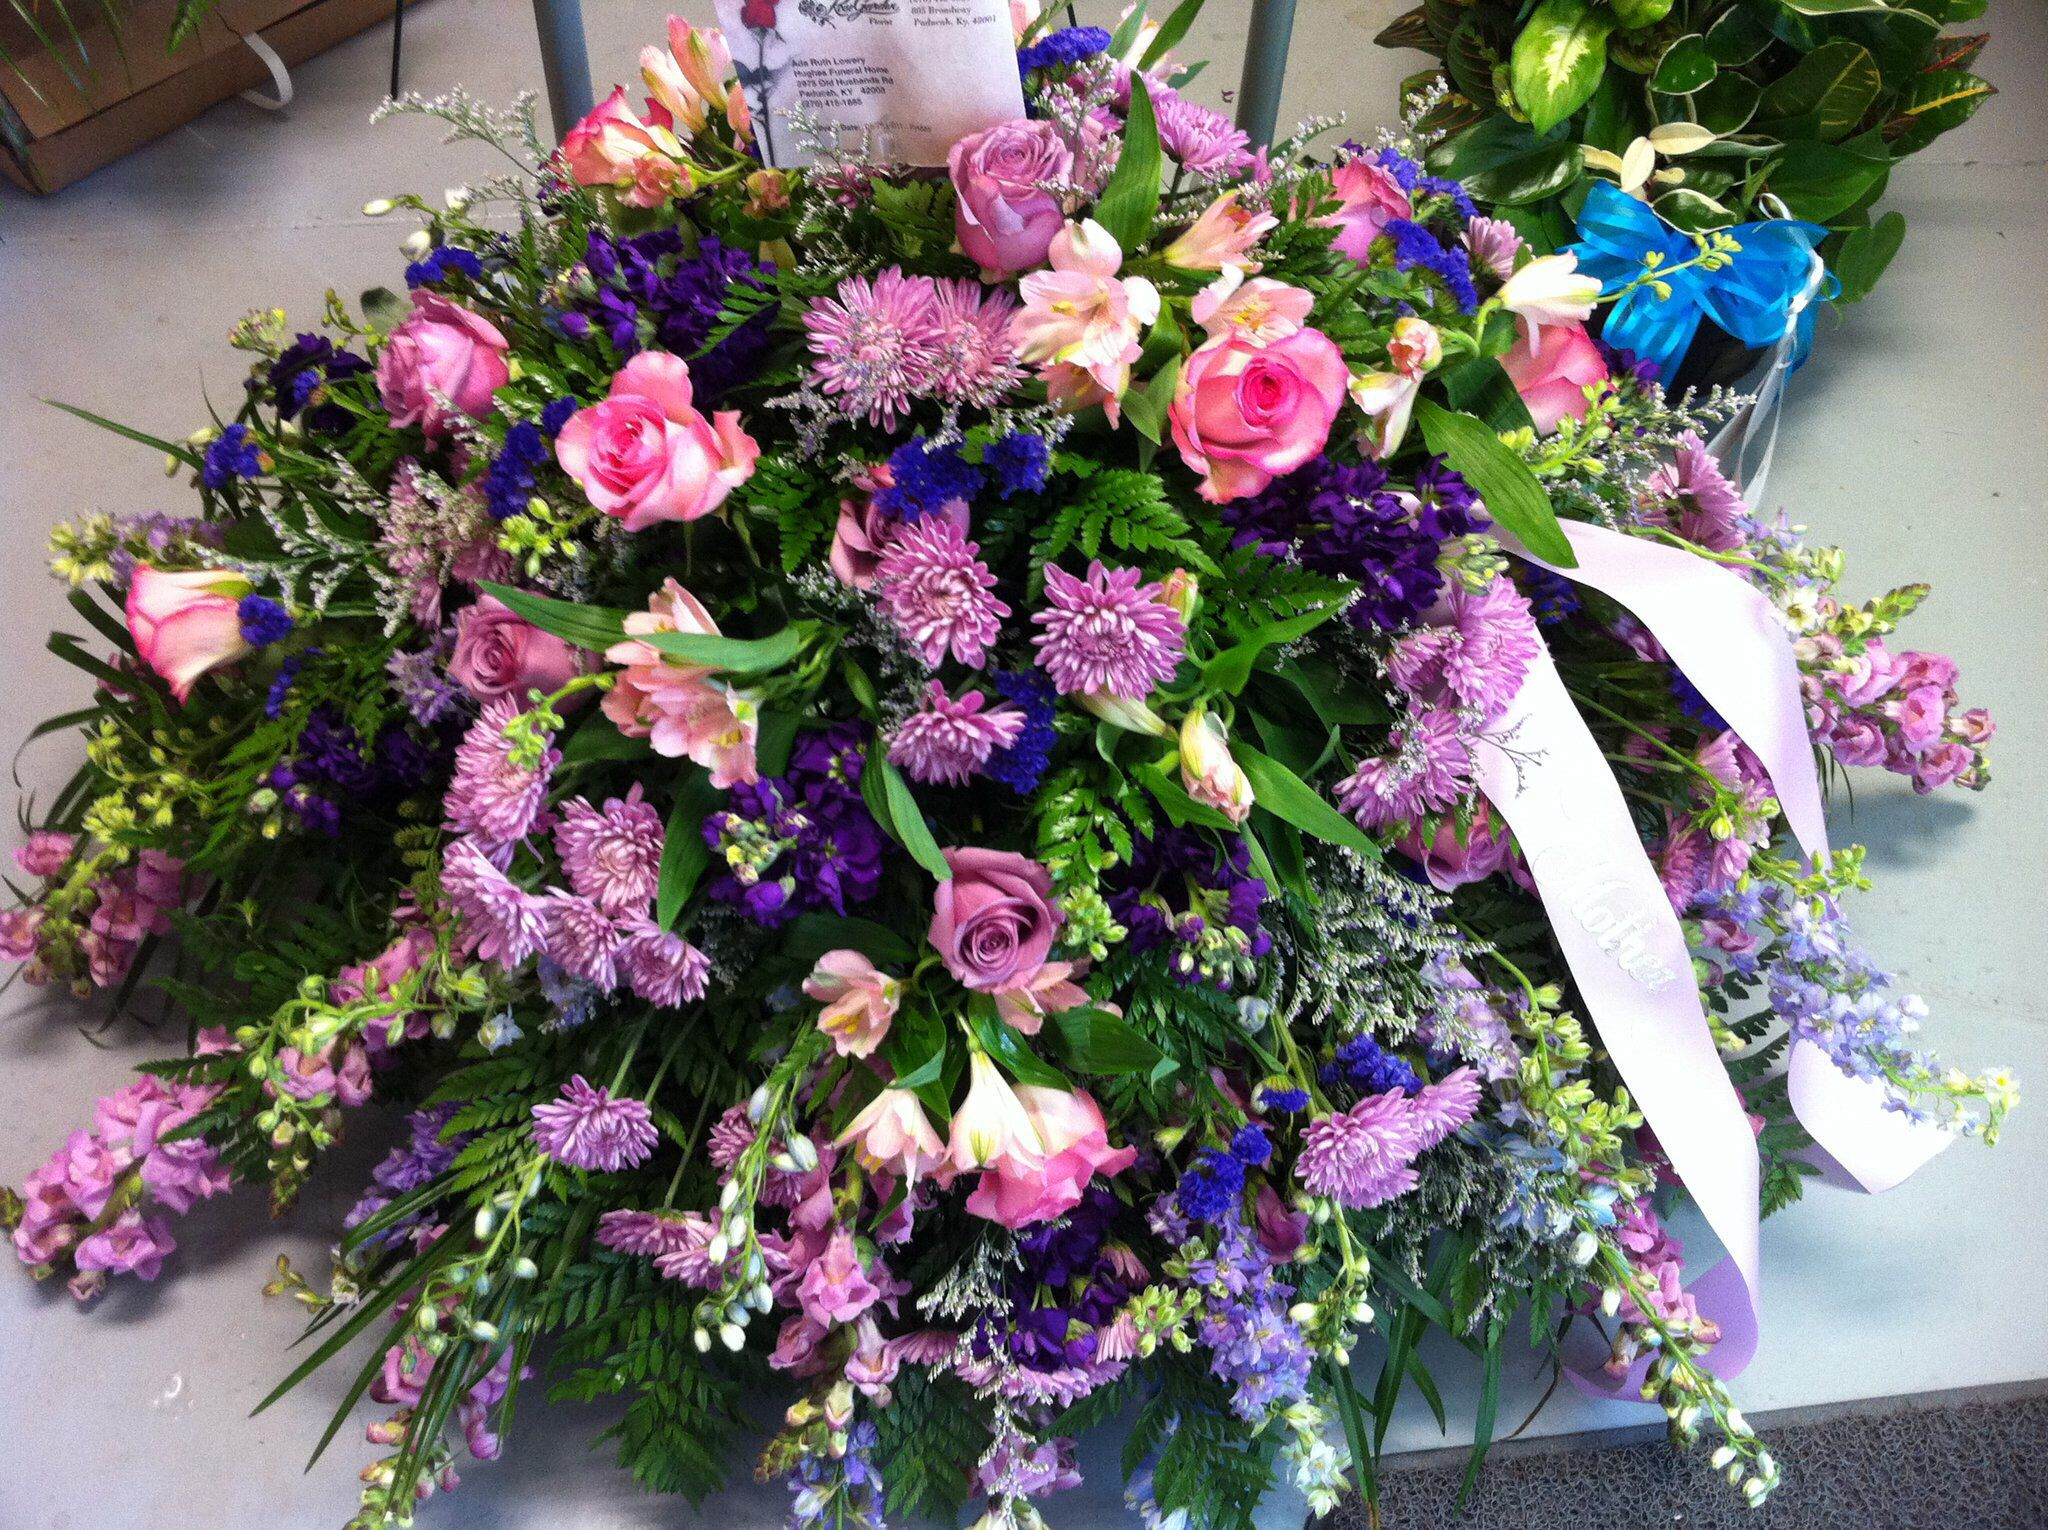 Rose Garden Florist   Paducah Kentucky Sympathy Arrangement Casket Spray  Memorial Flowers Funeral Flowers Lavender Purple Design Inspirations